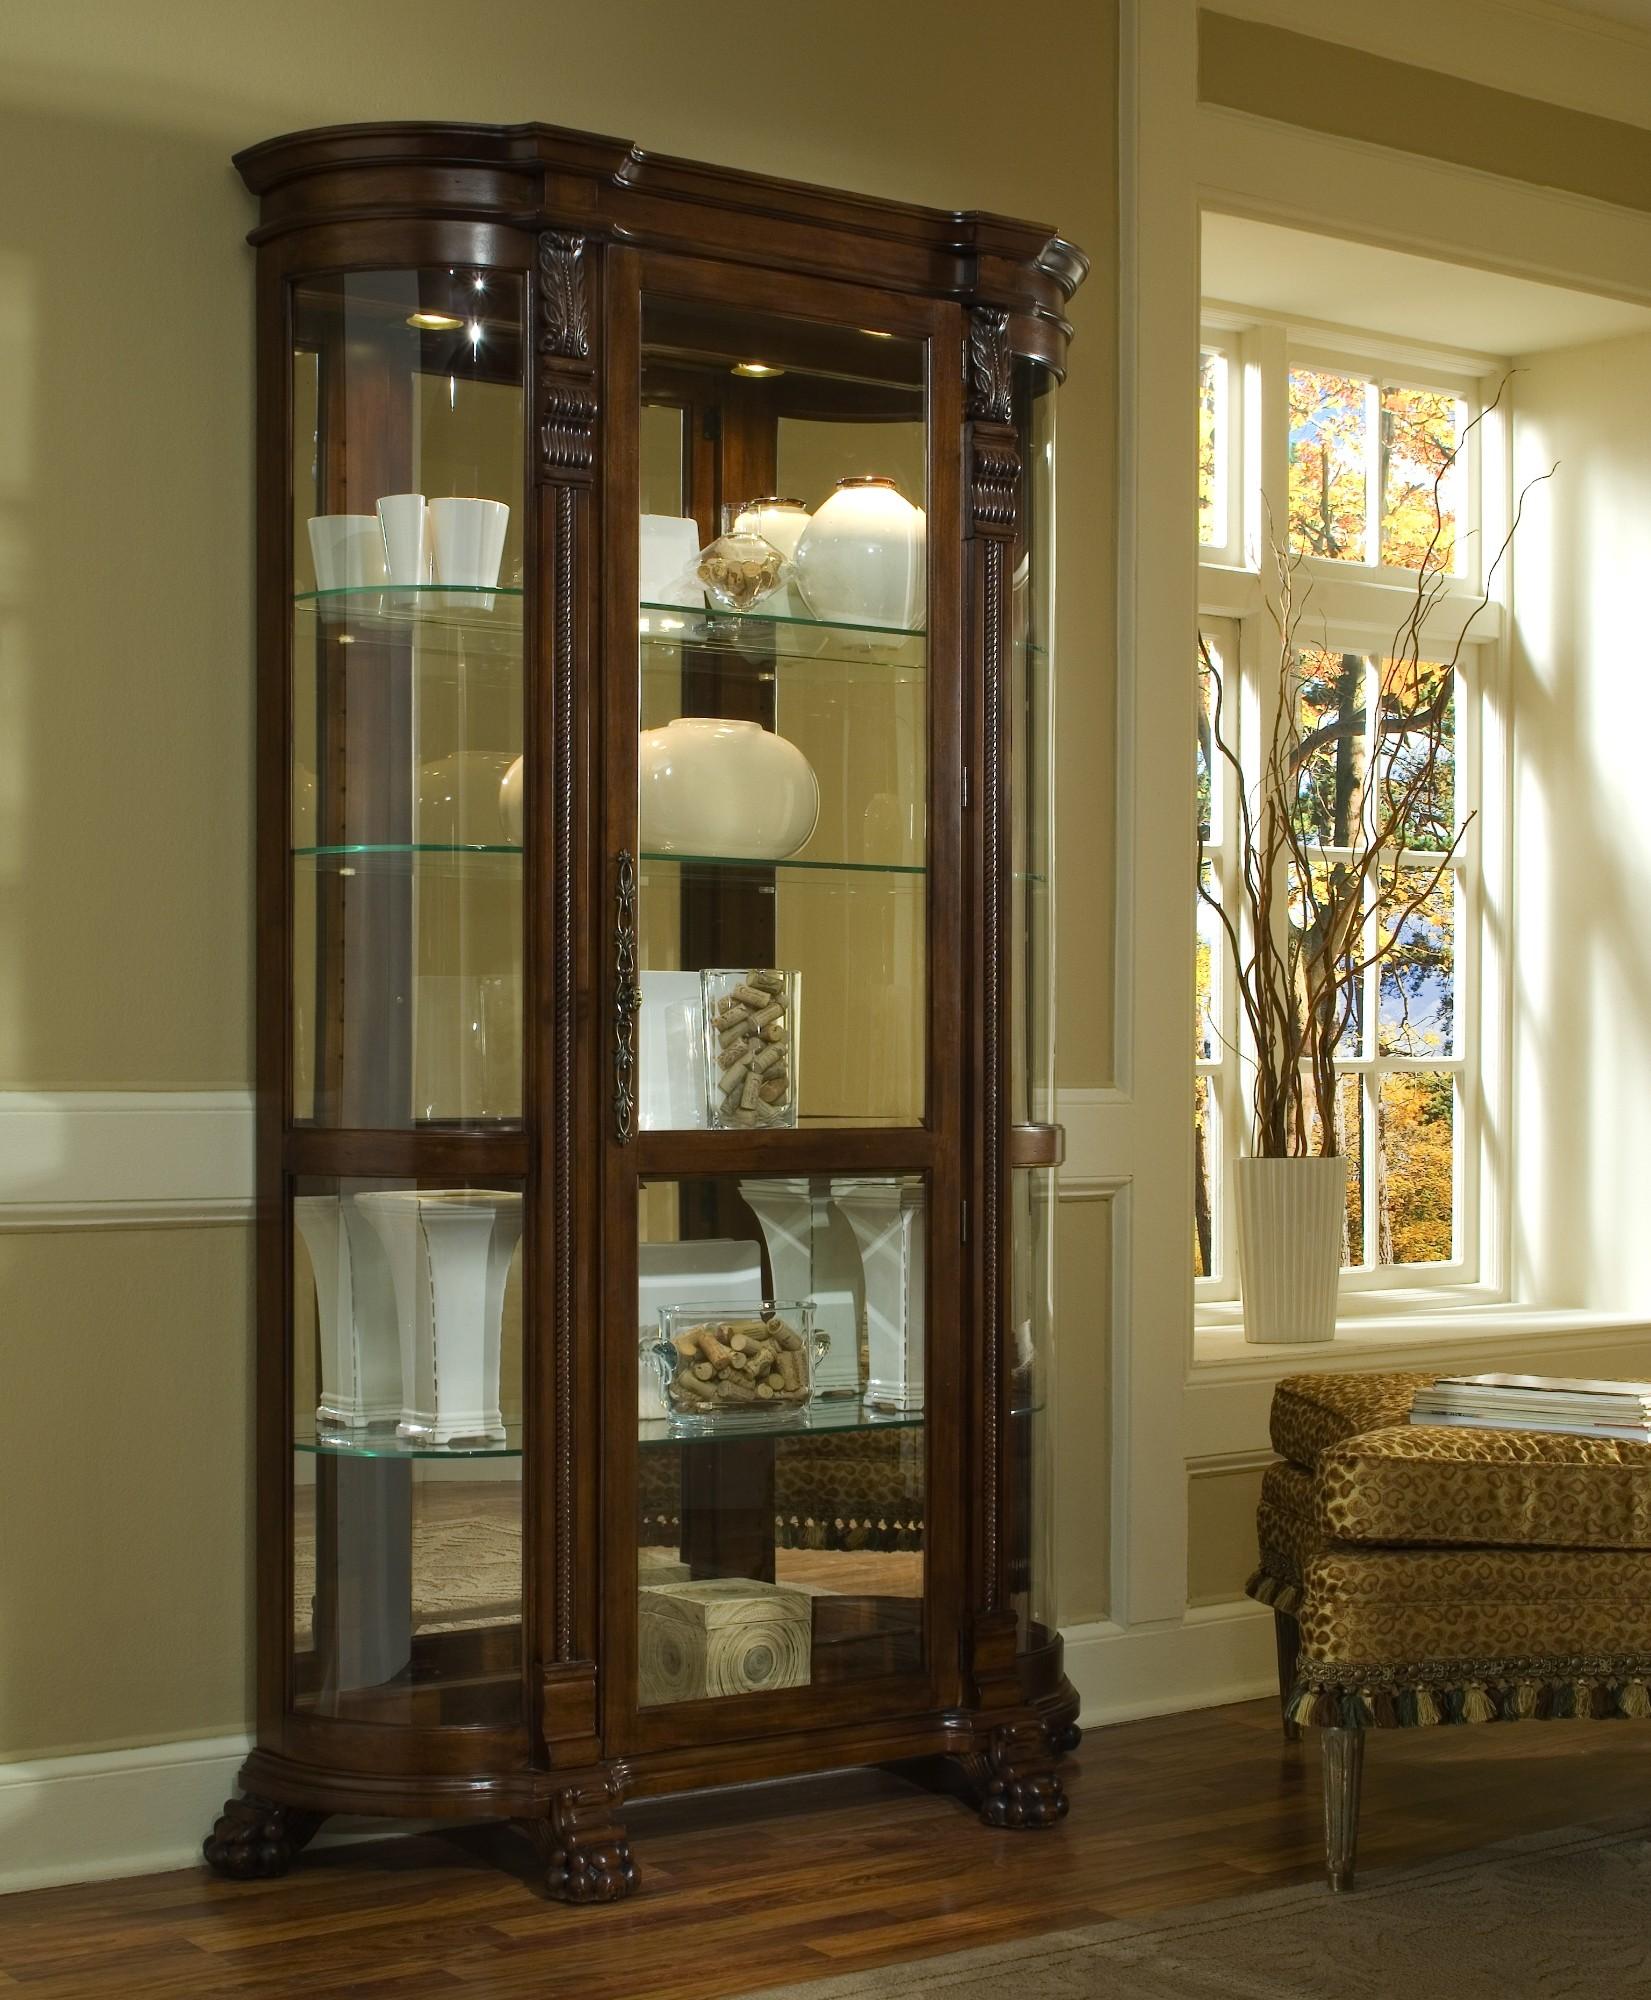 Foxcroft Curio Cabinet From Pulaski 102003 Coleman Furniture